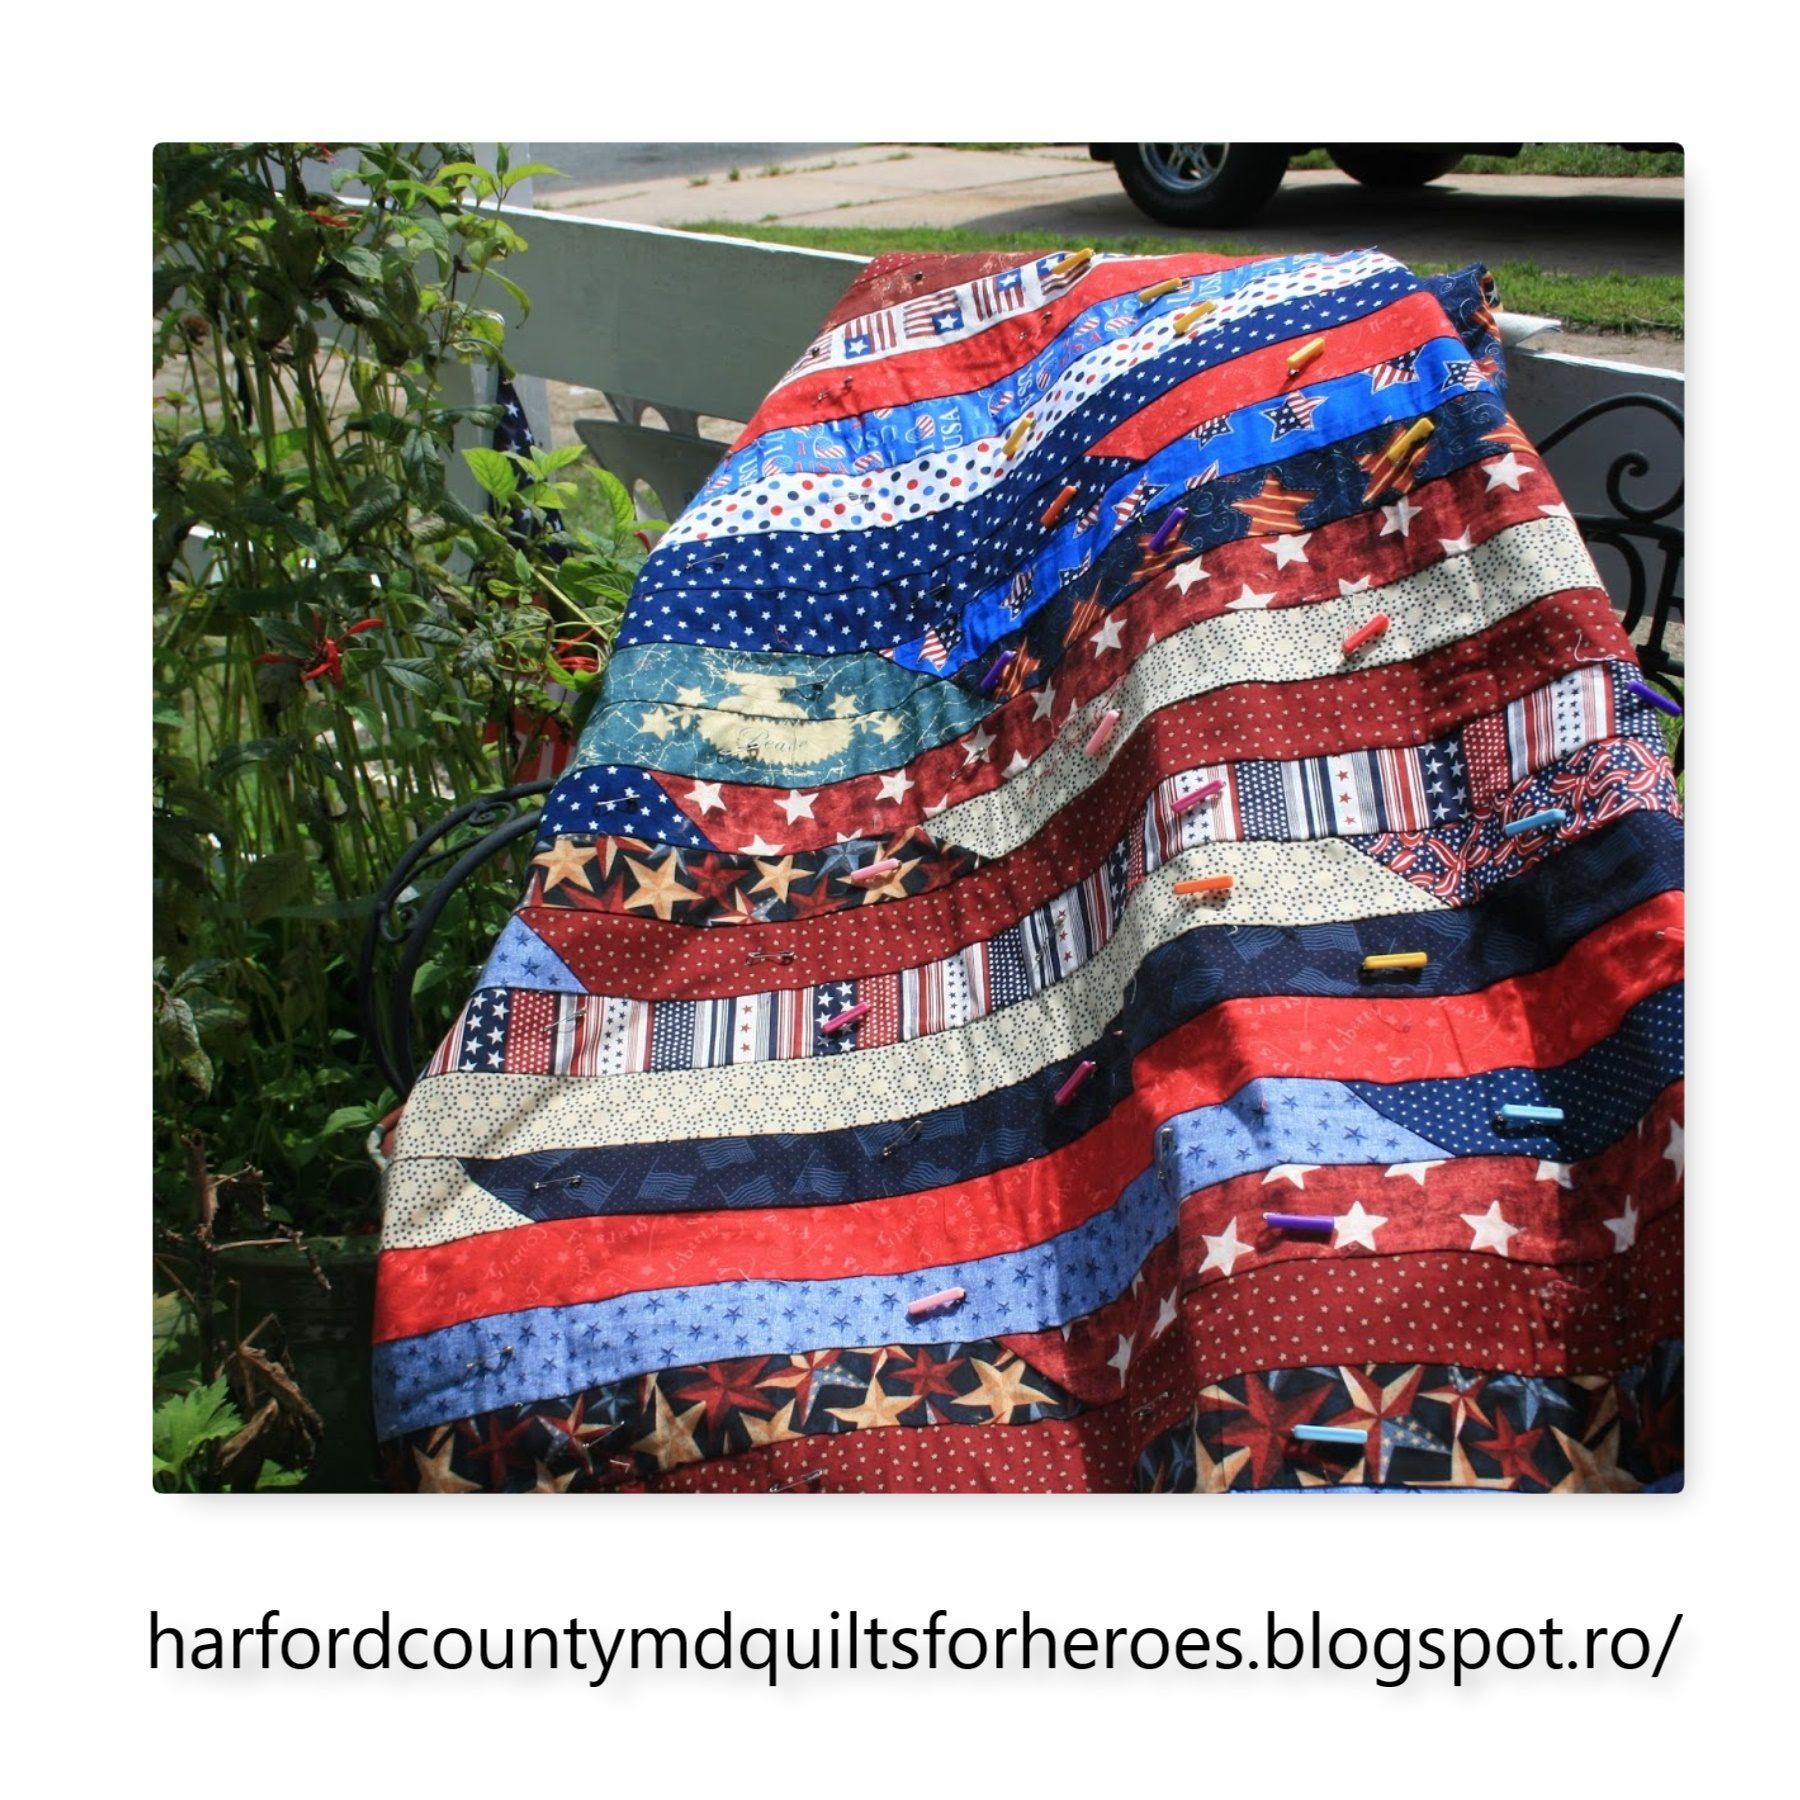 5_harfordcountymdquiltsforheroes